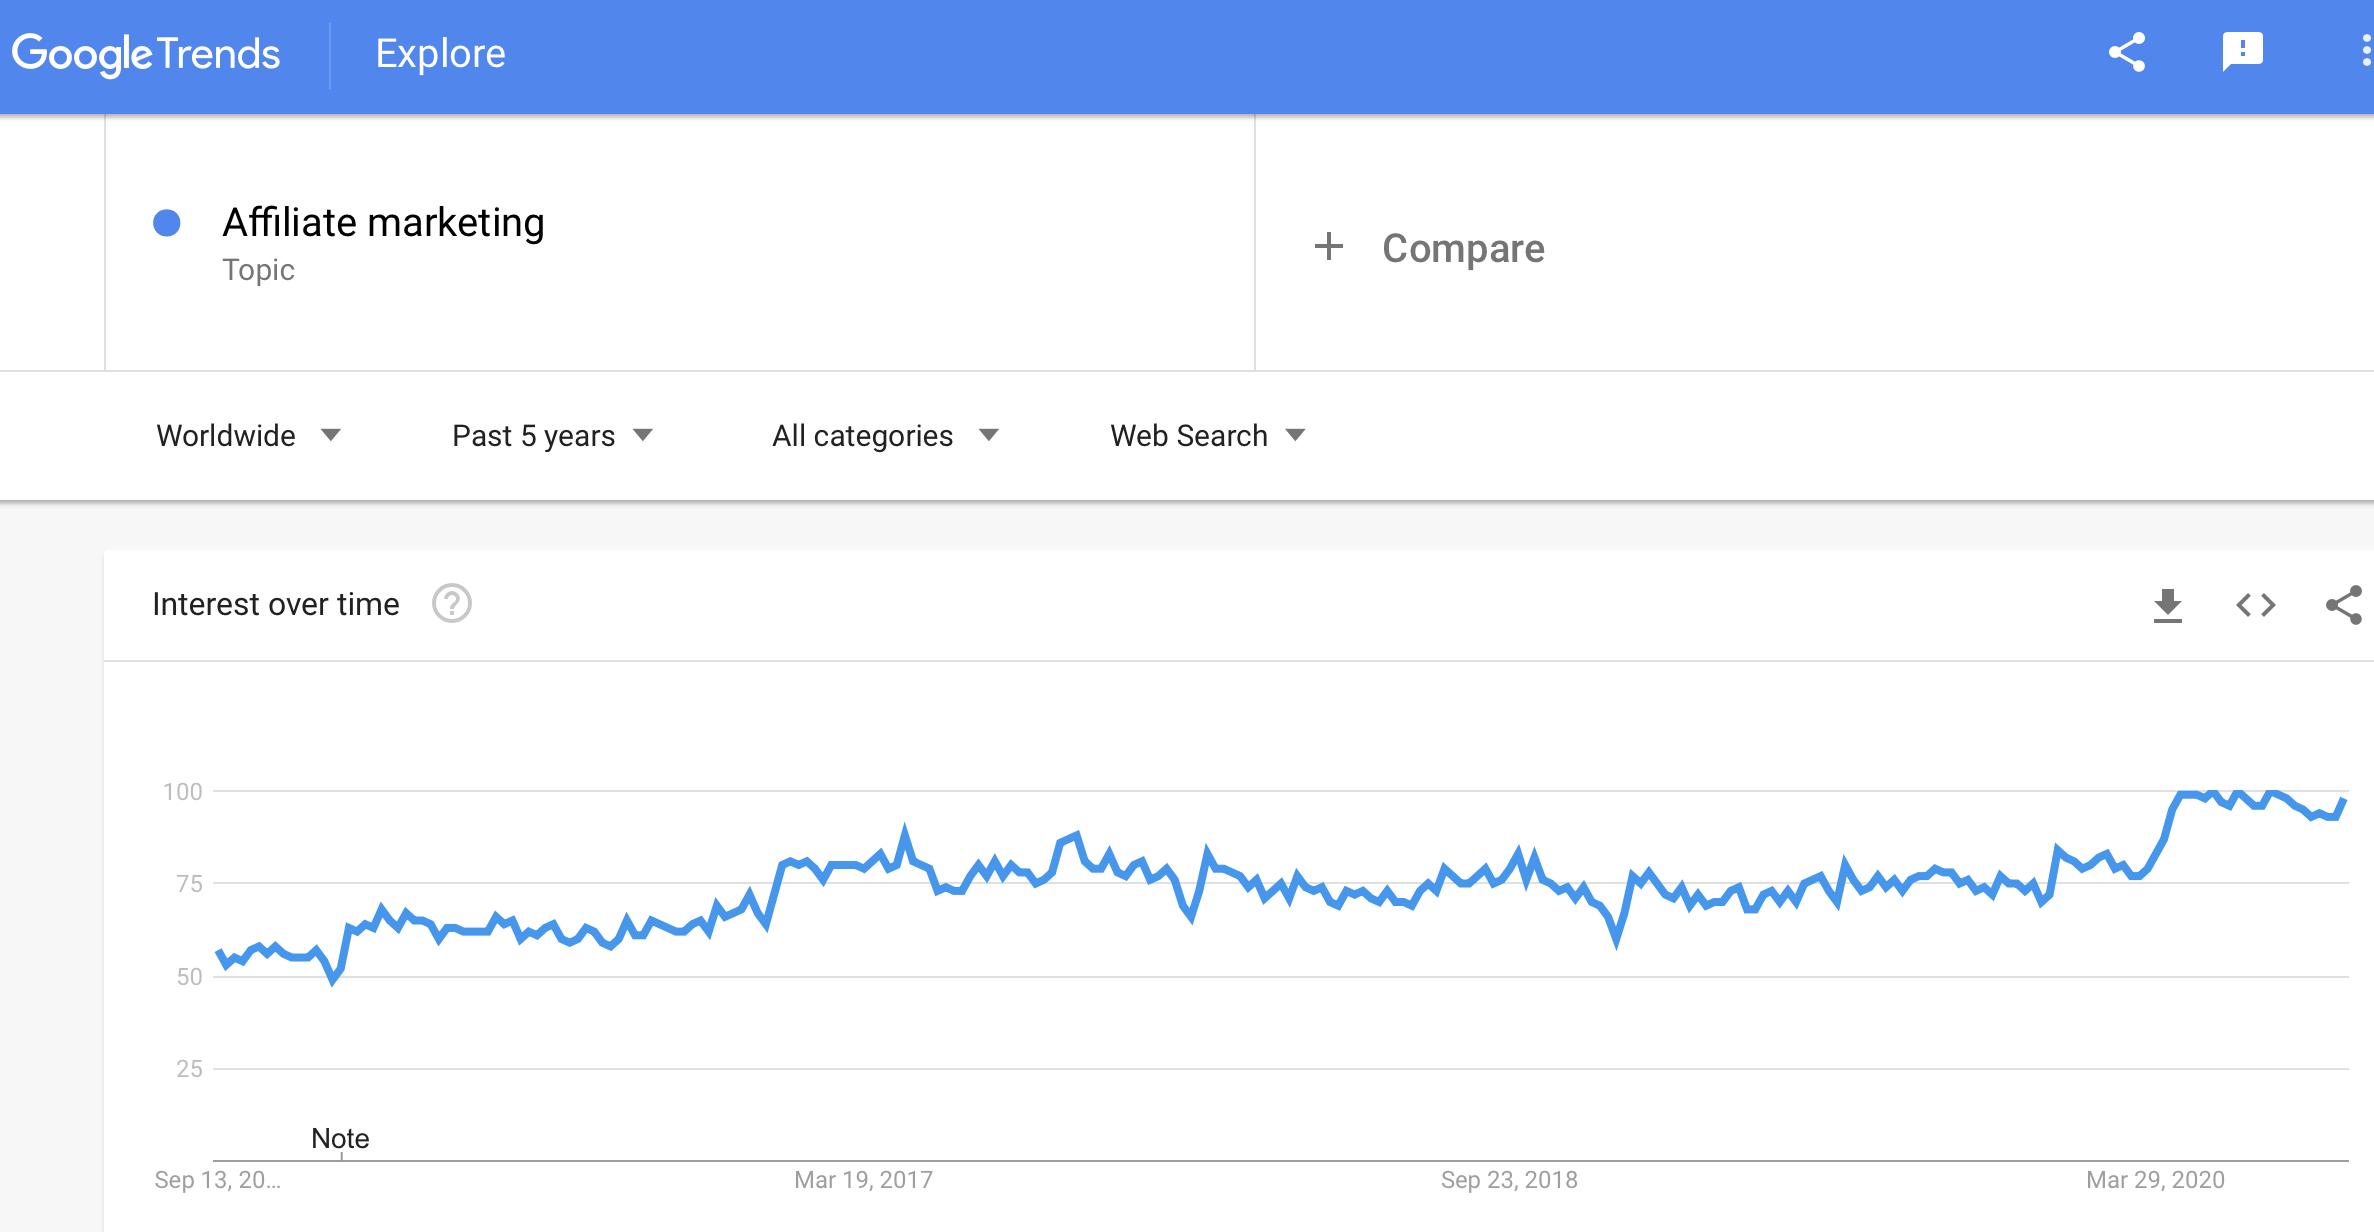 Affiliate-Marketing Trend